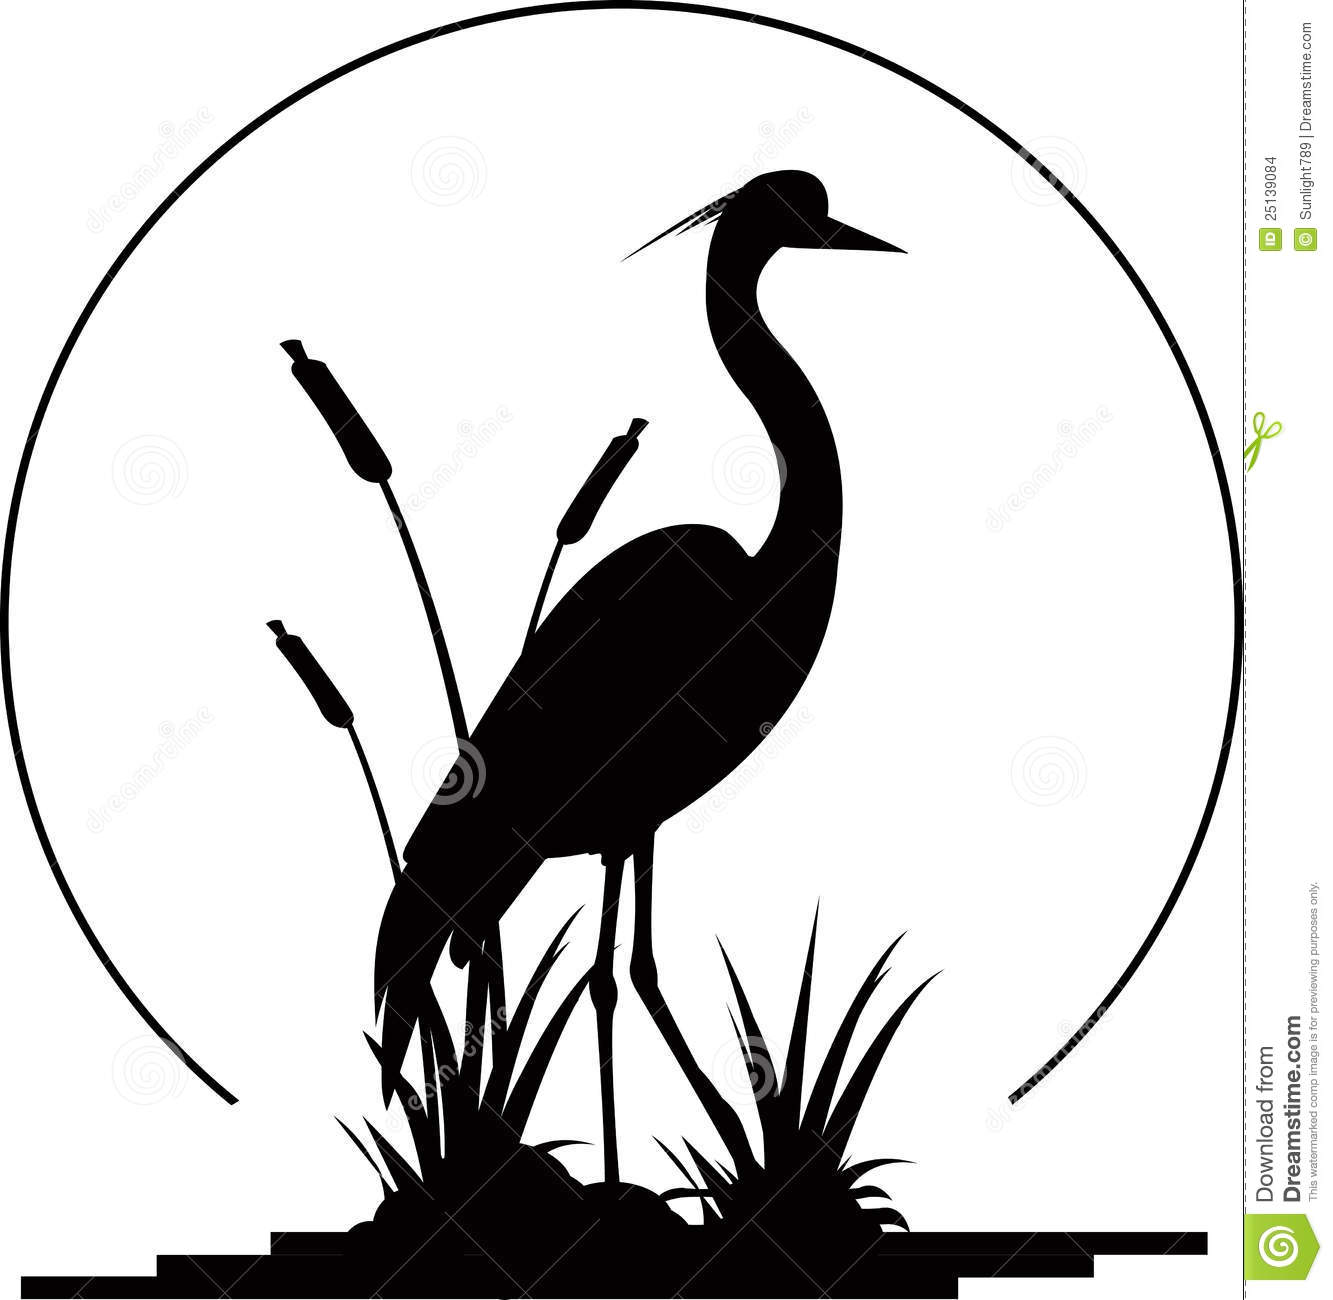 Blue heron silhouette clip art.